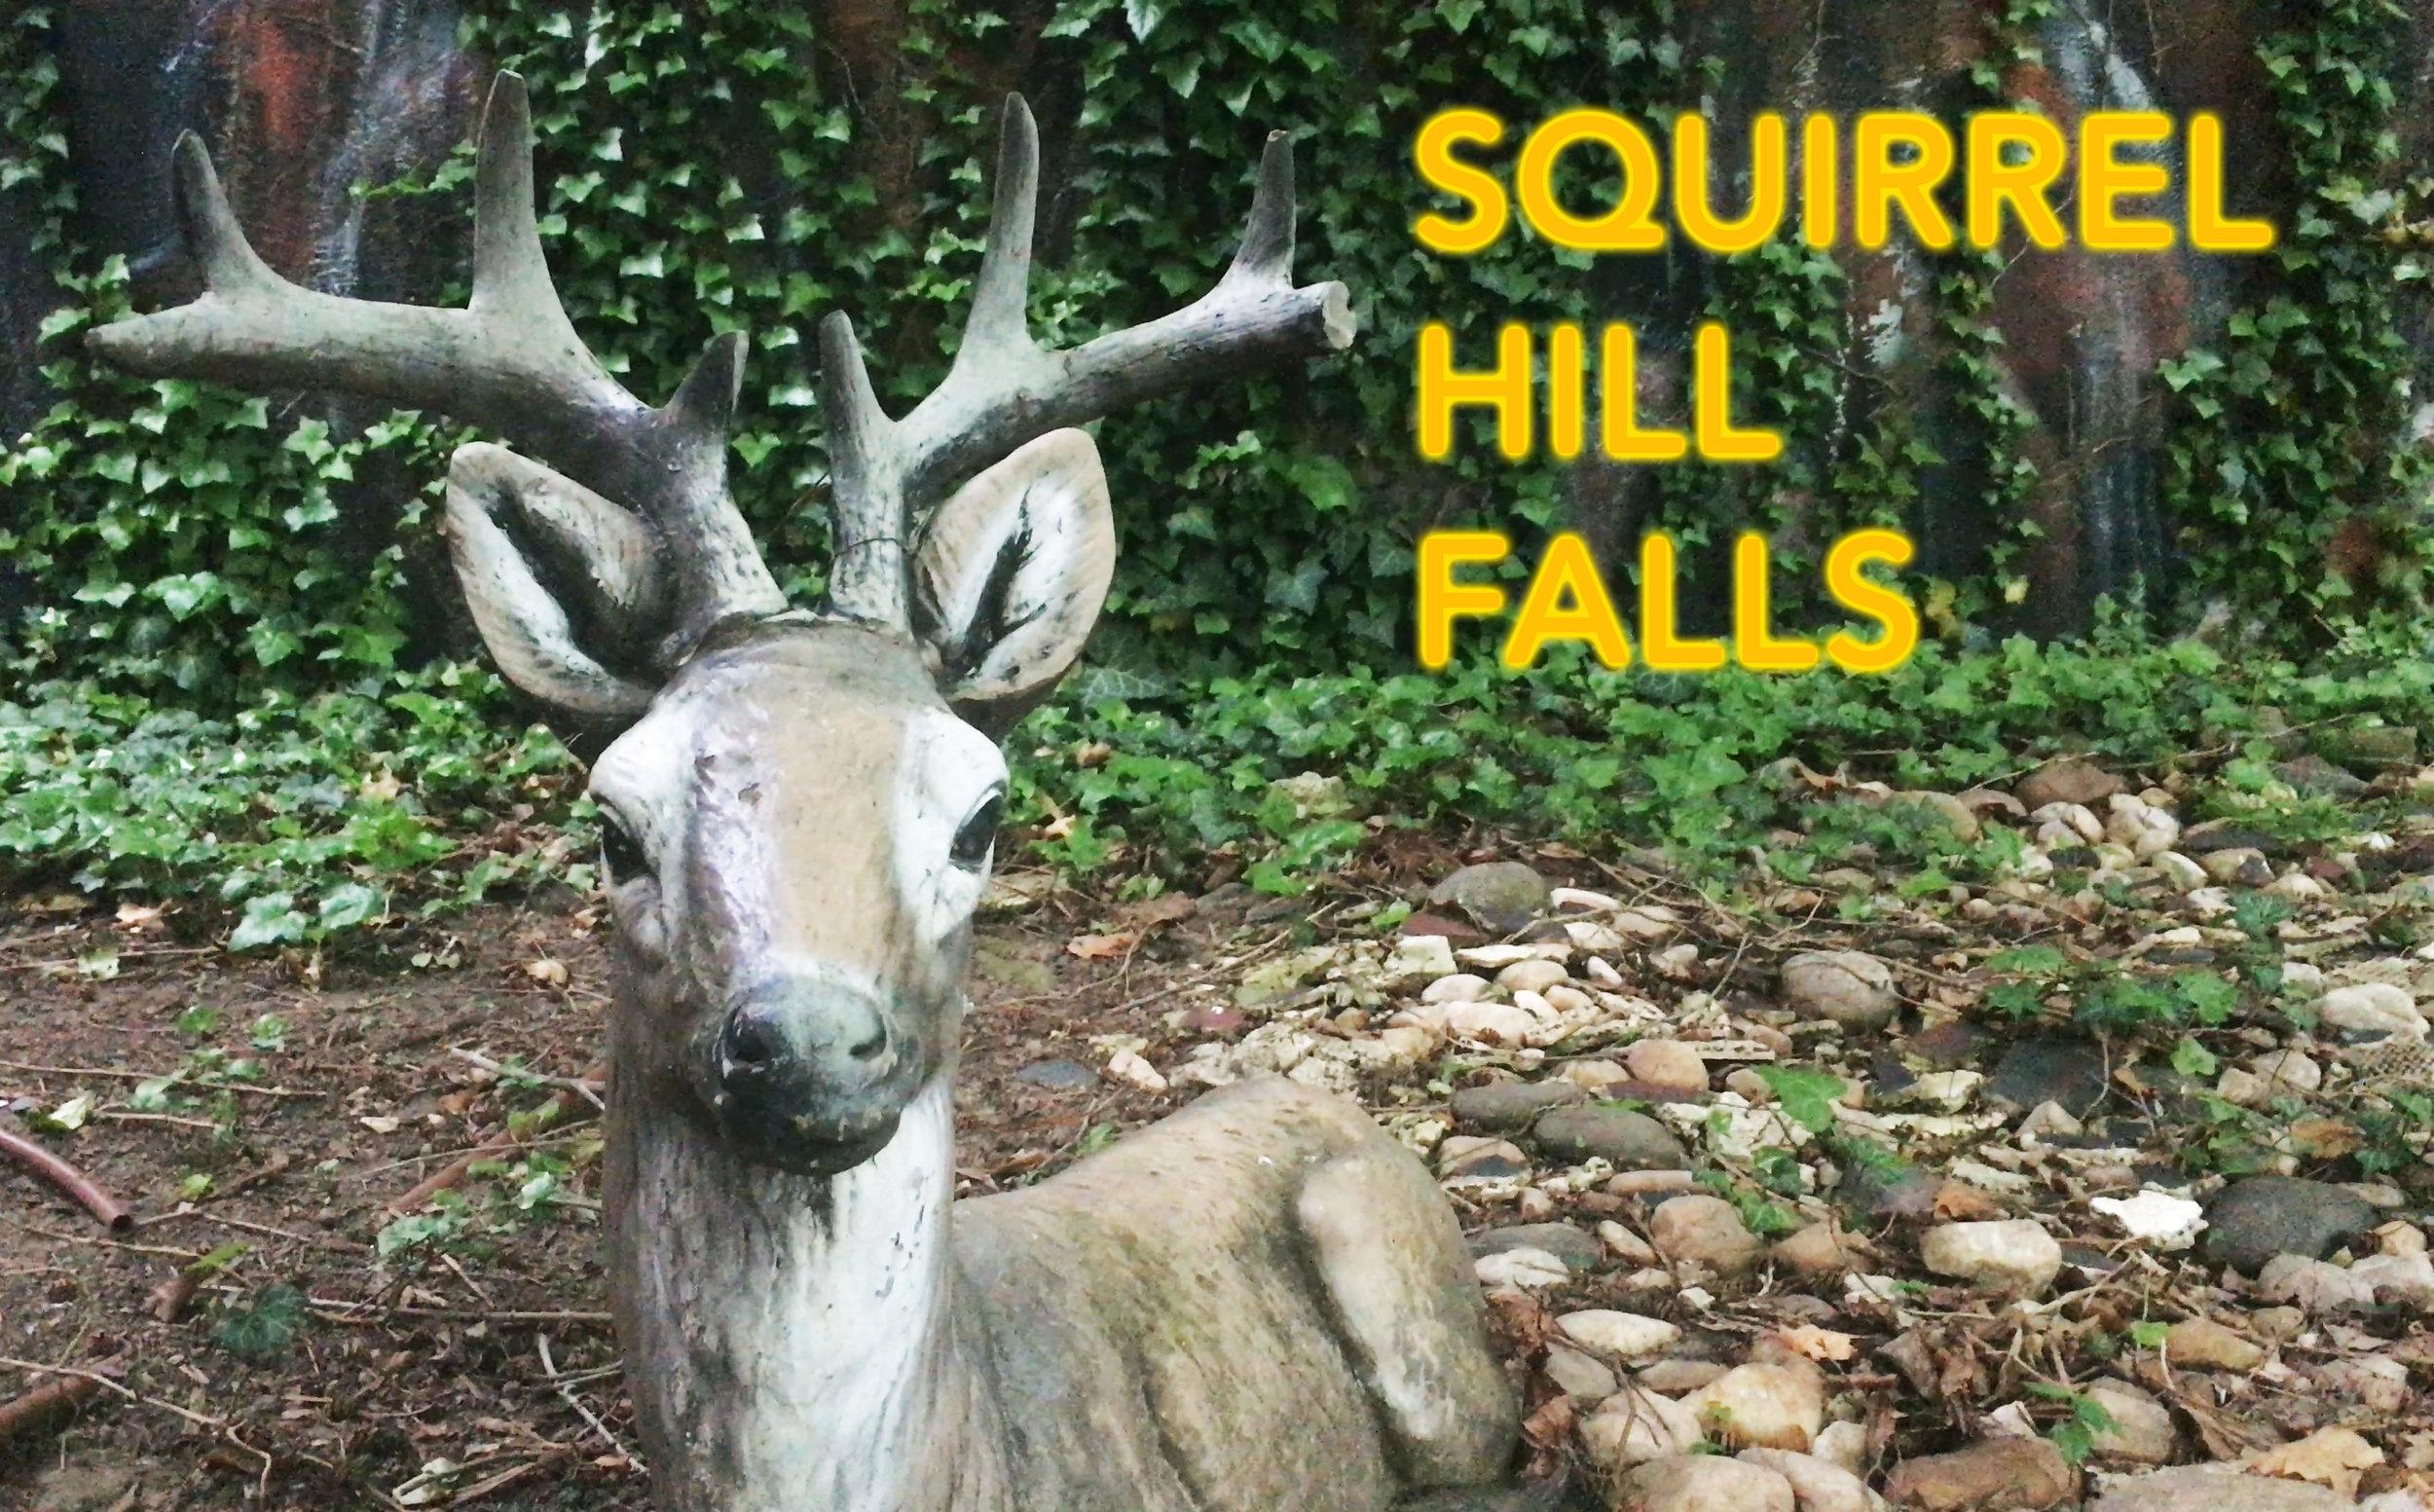 Squirrel Hill Falls .jpg